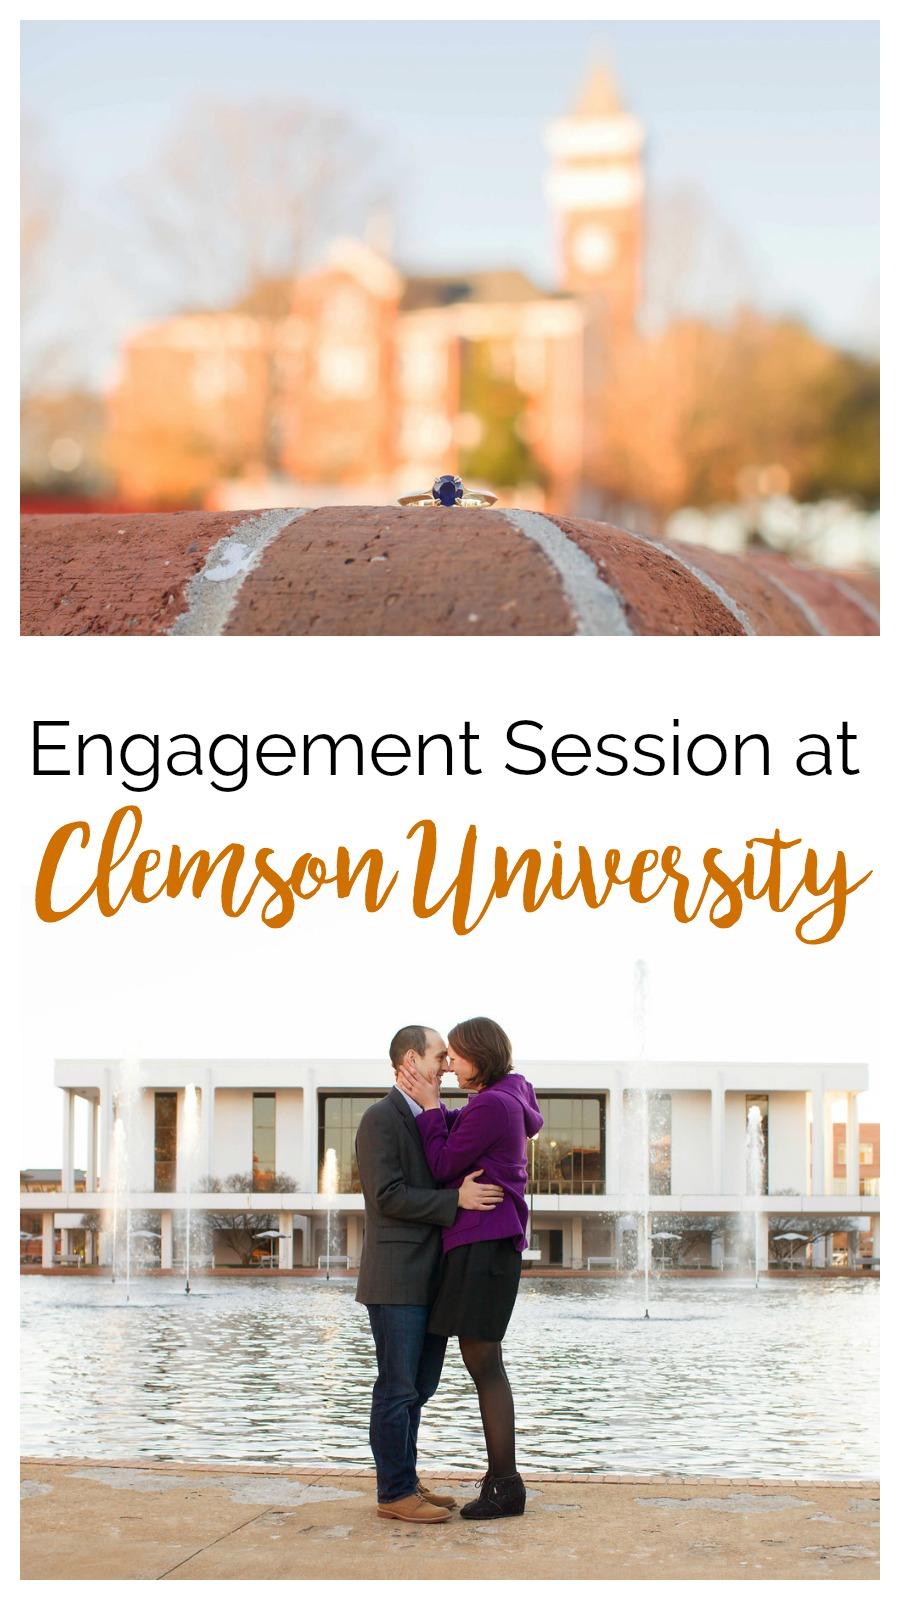 Diana + Andrew: Engagement Session at Clemson University | Palmetto State Weddings | Christine Scott Photography | Clemson wedding | South Carolina wedding